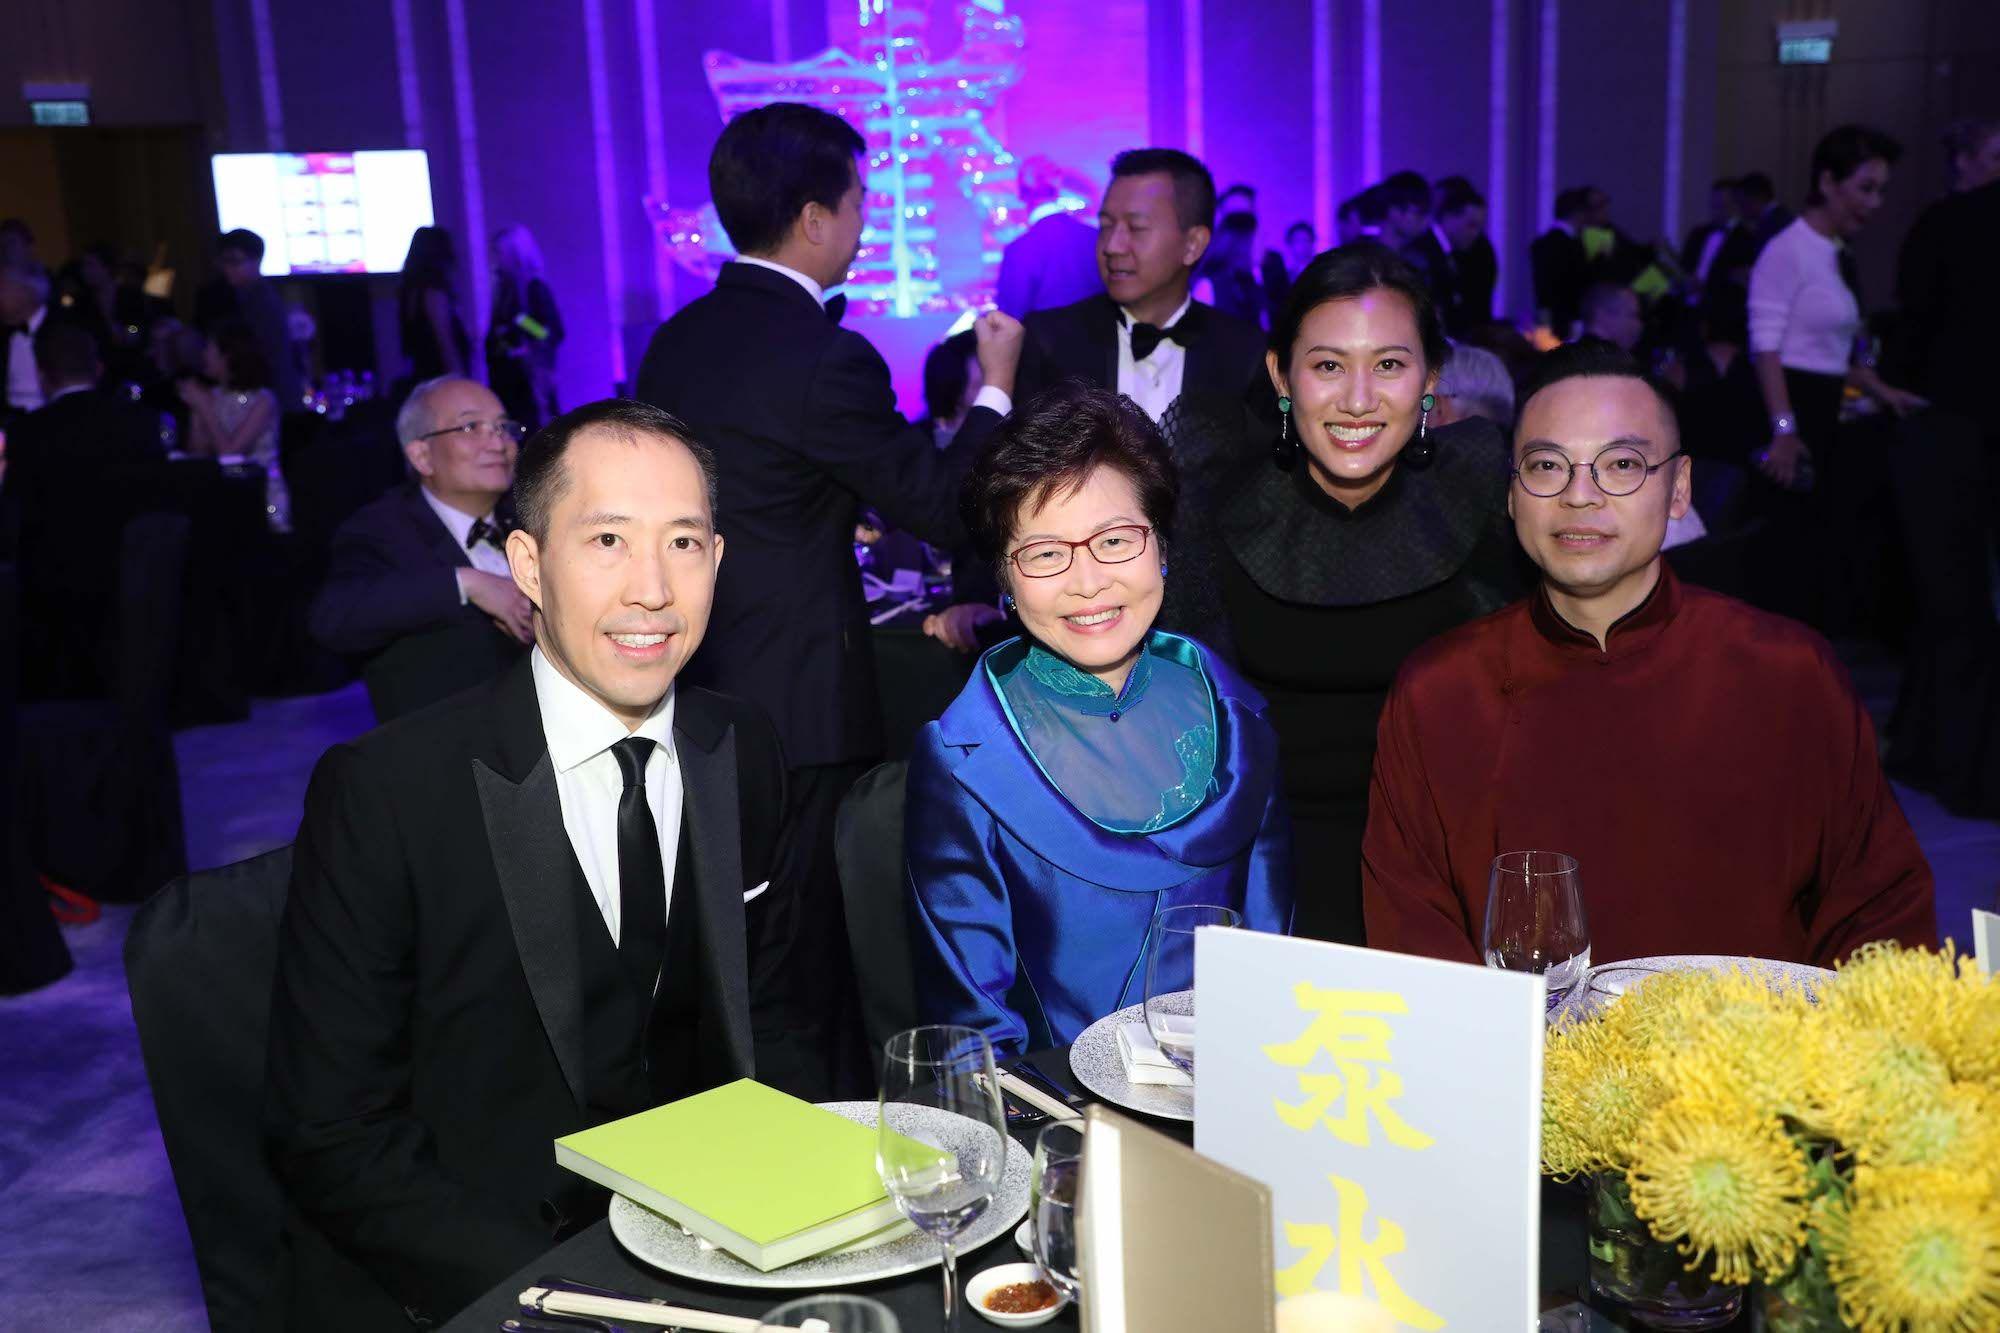 Darryl Ng, Carrie Lam, Marisa Yiu, Alan Lo